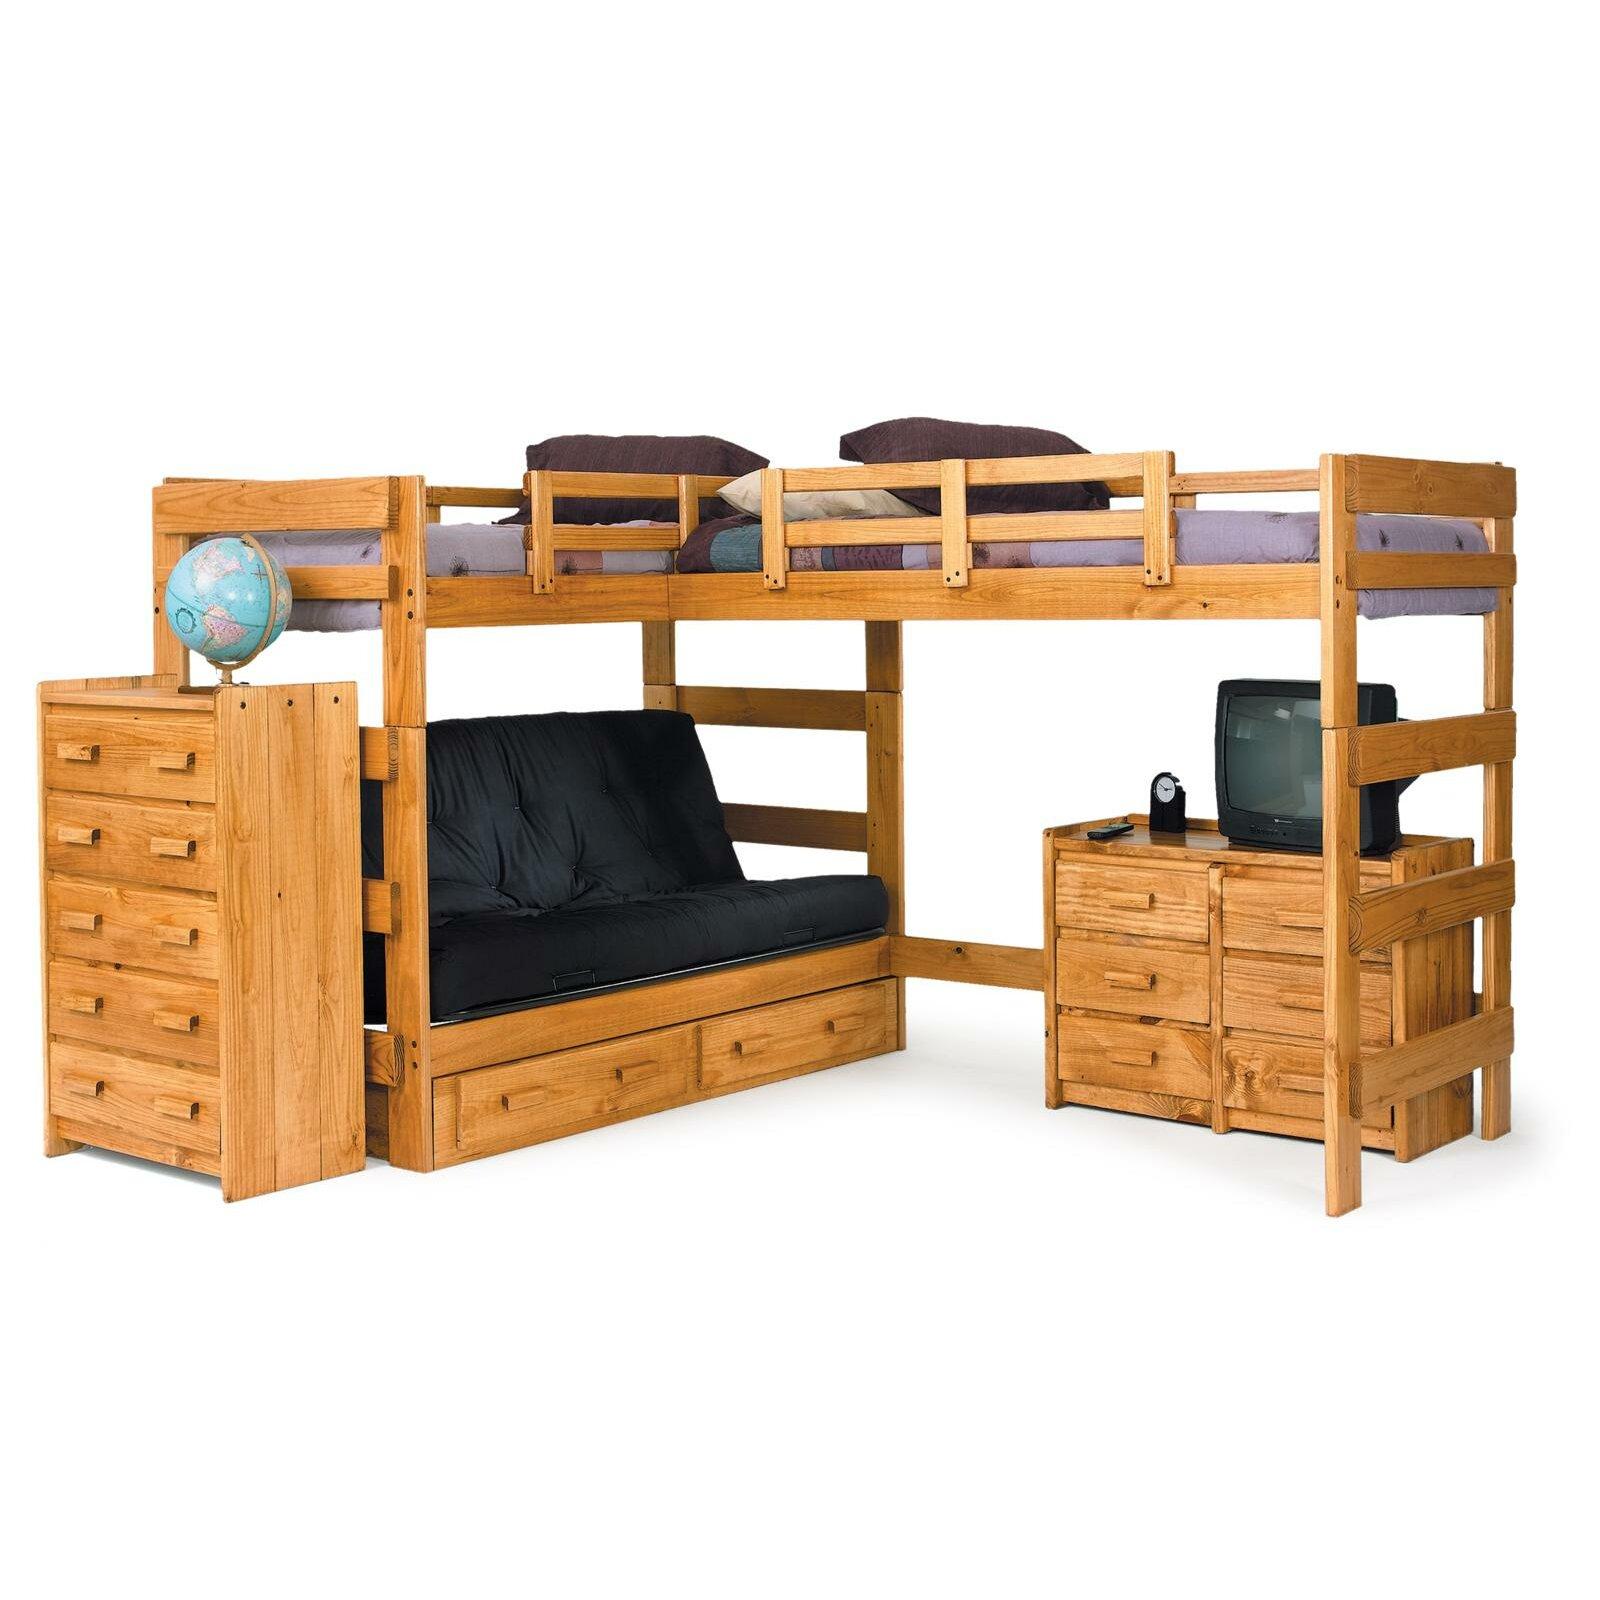 L Shaped Bunk Bed Customizable Bedroom Set